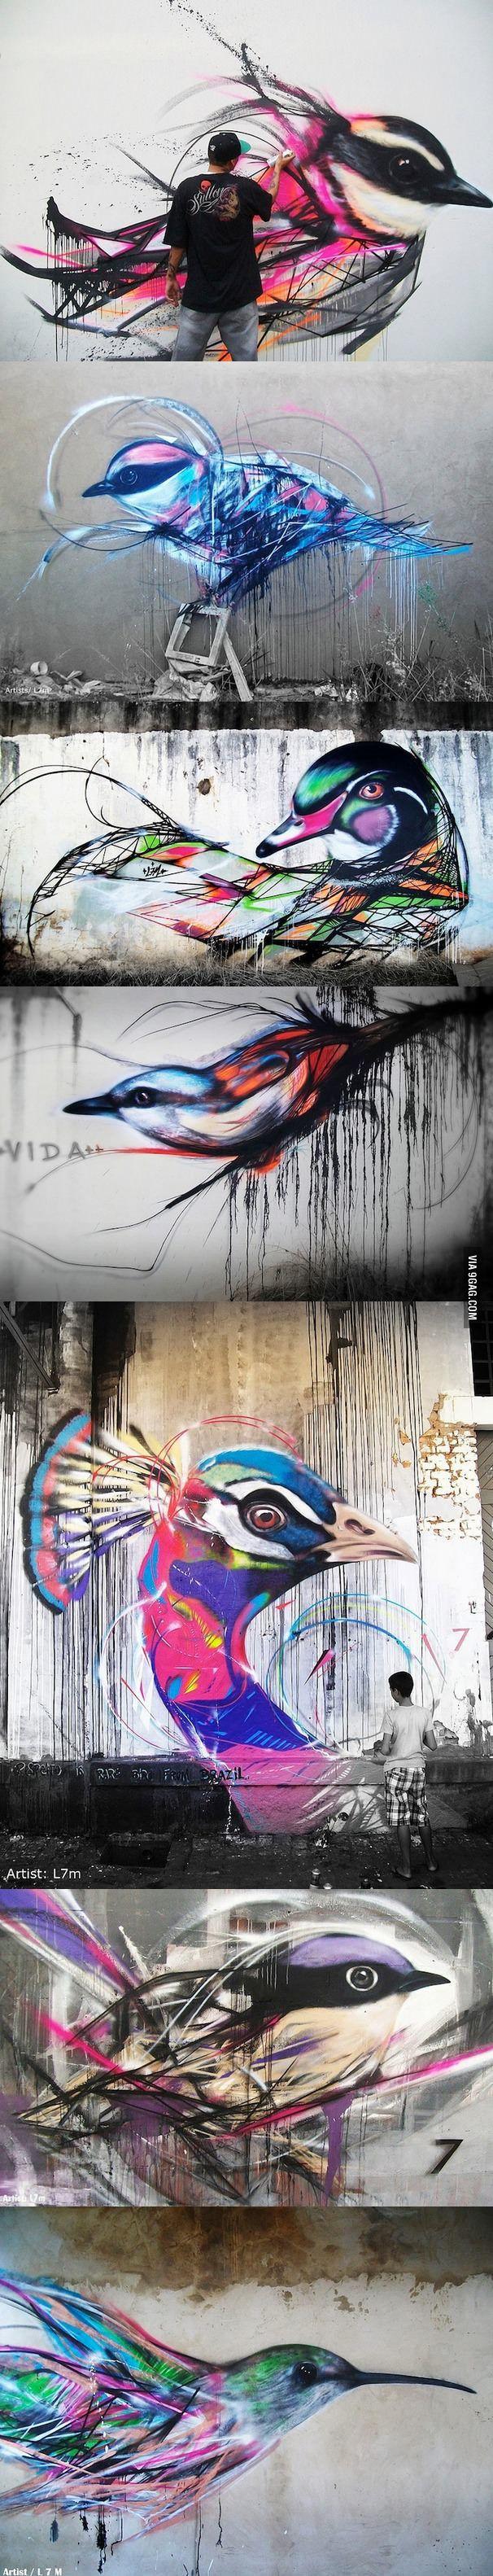 Sample of graffiti street art style for animals in mural